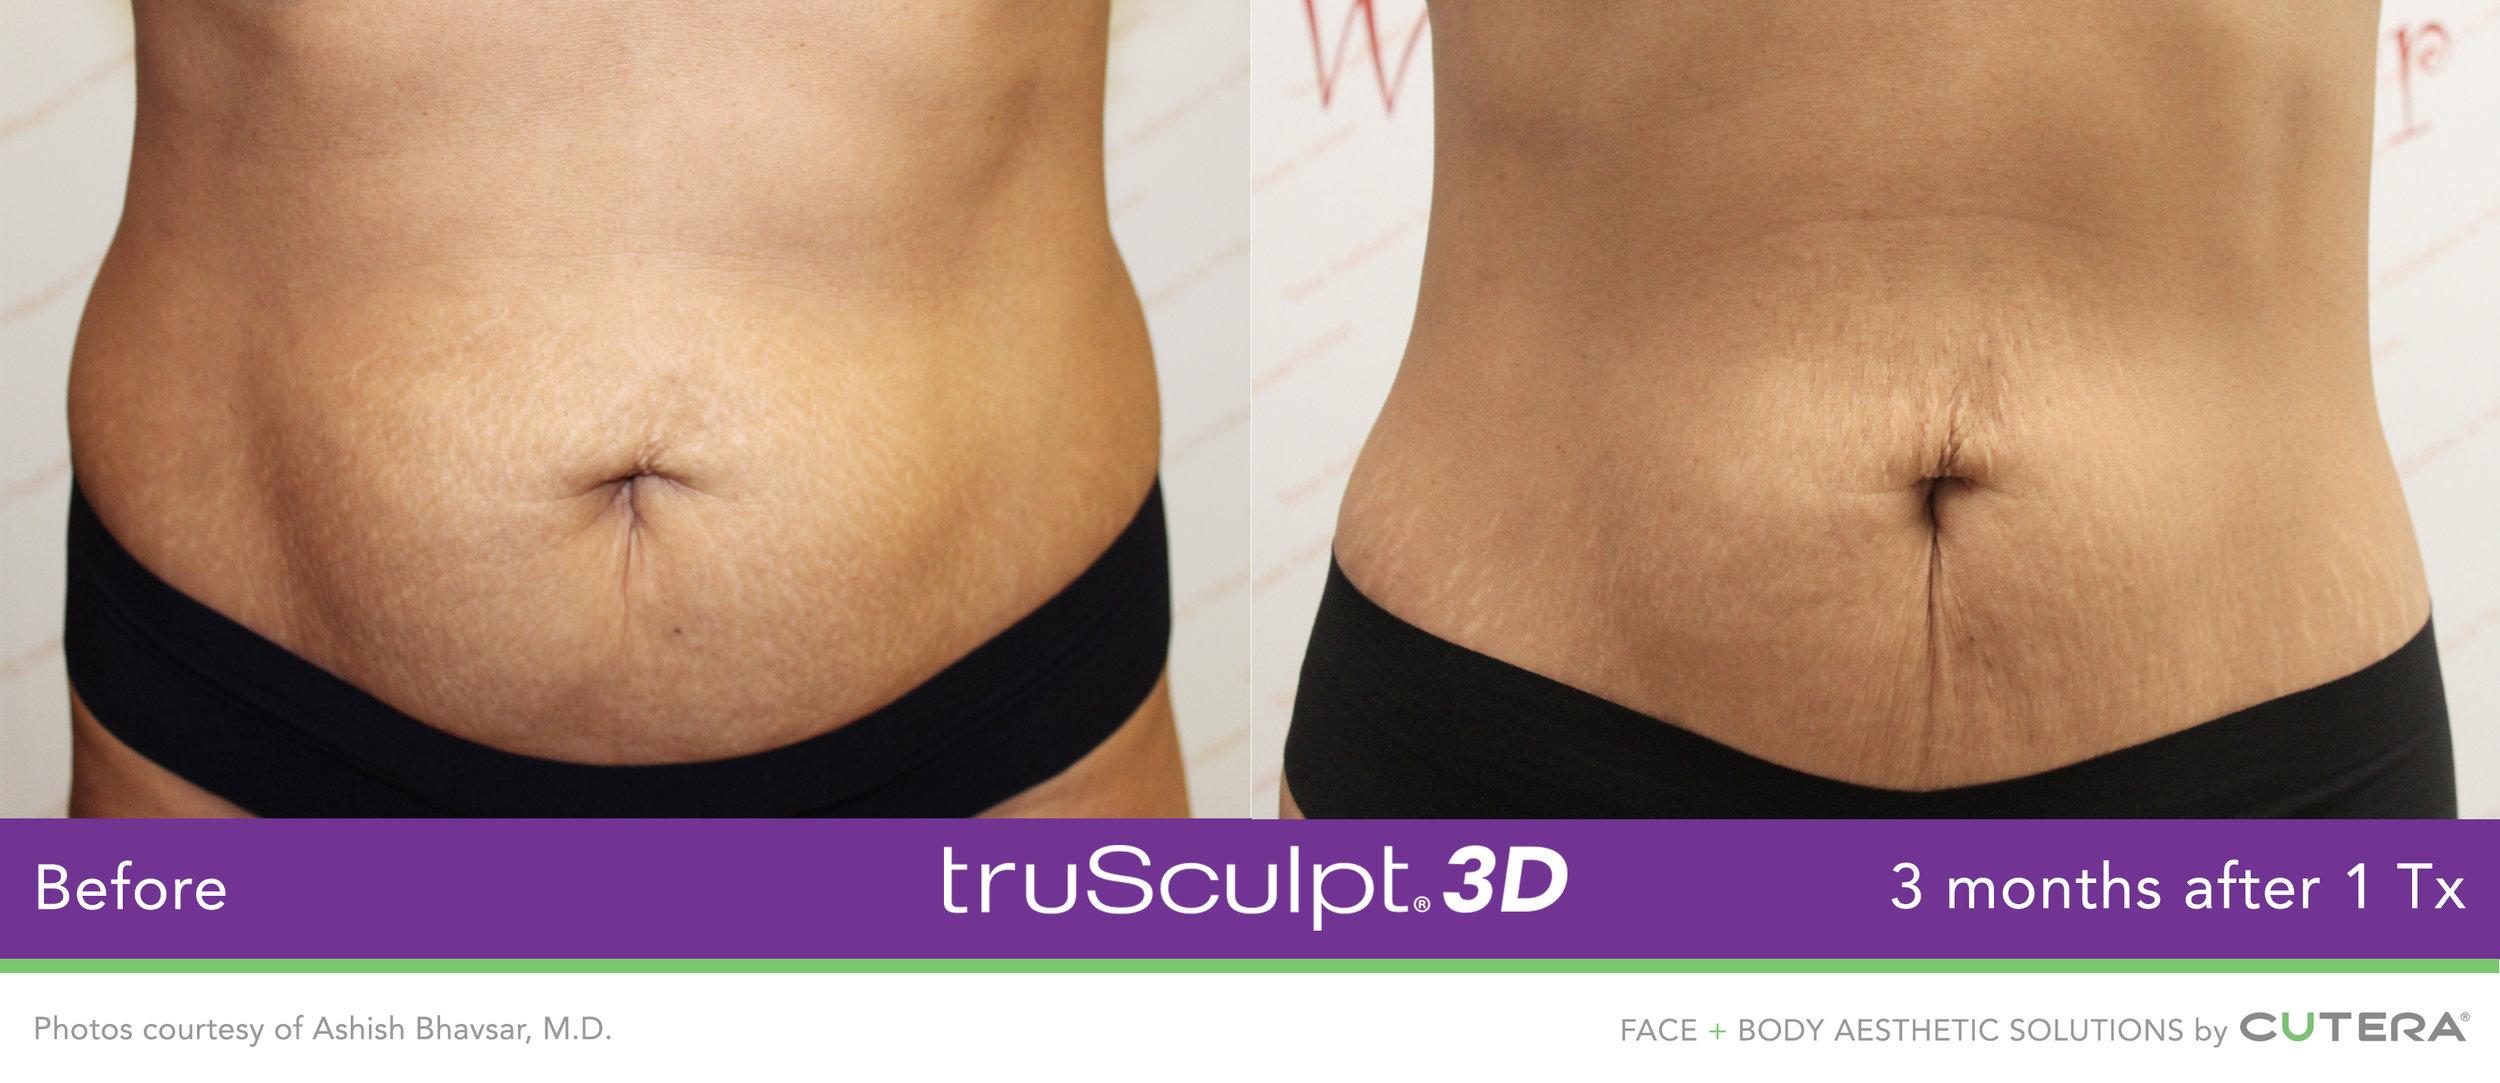 truSculpt-3D-B-A-Image-12.jpg